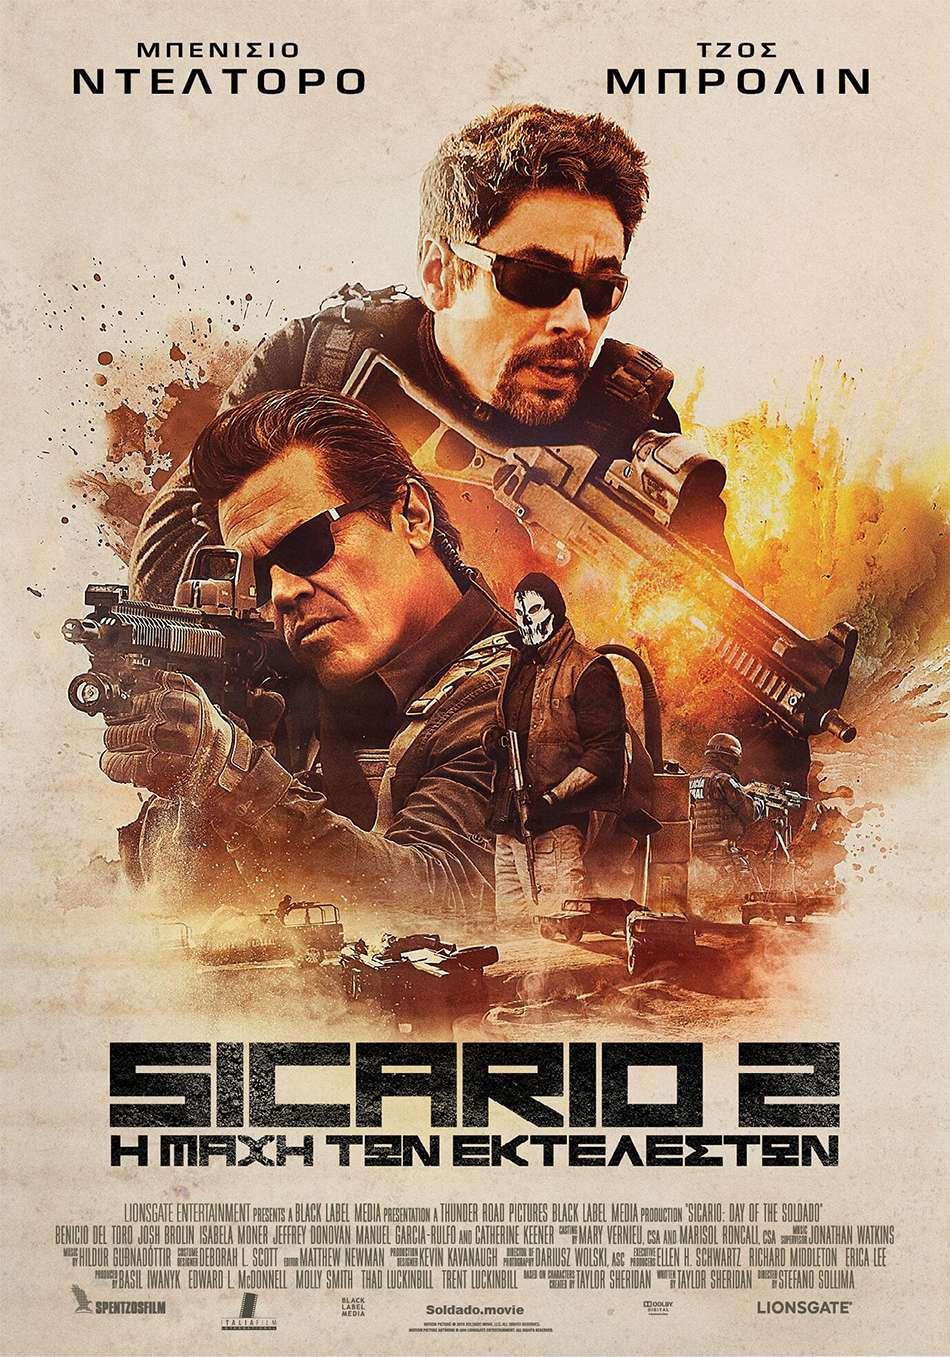 Sicario 2: Η μάχη των εκτελεστών (Sicario: Day of the Soldado) Poster Πόστερ